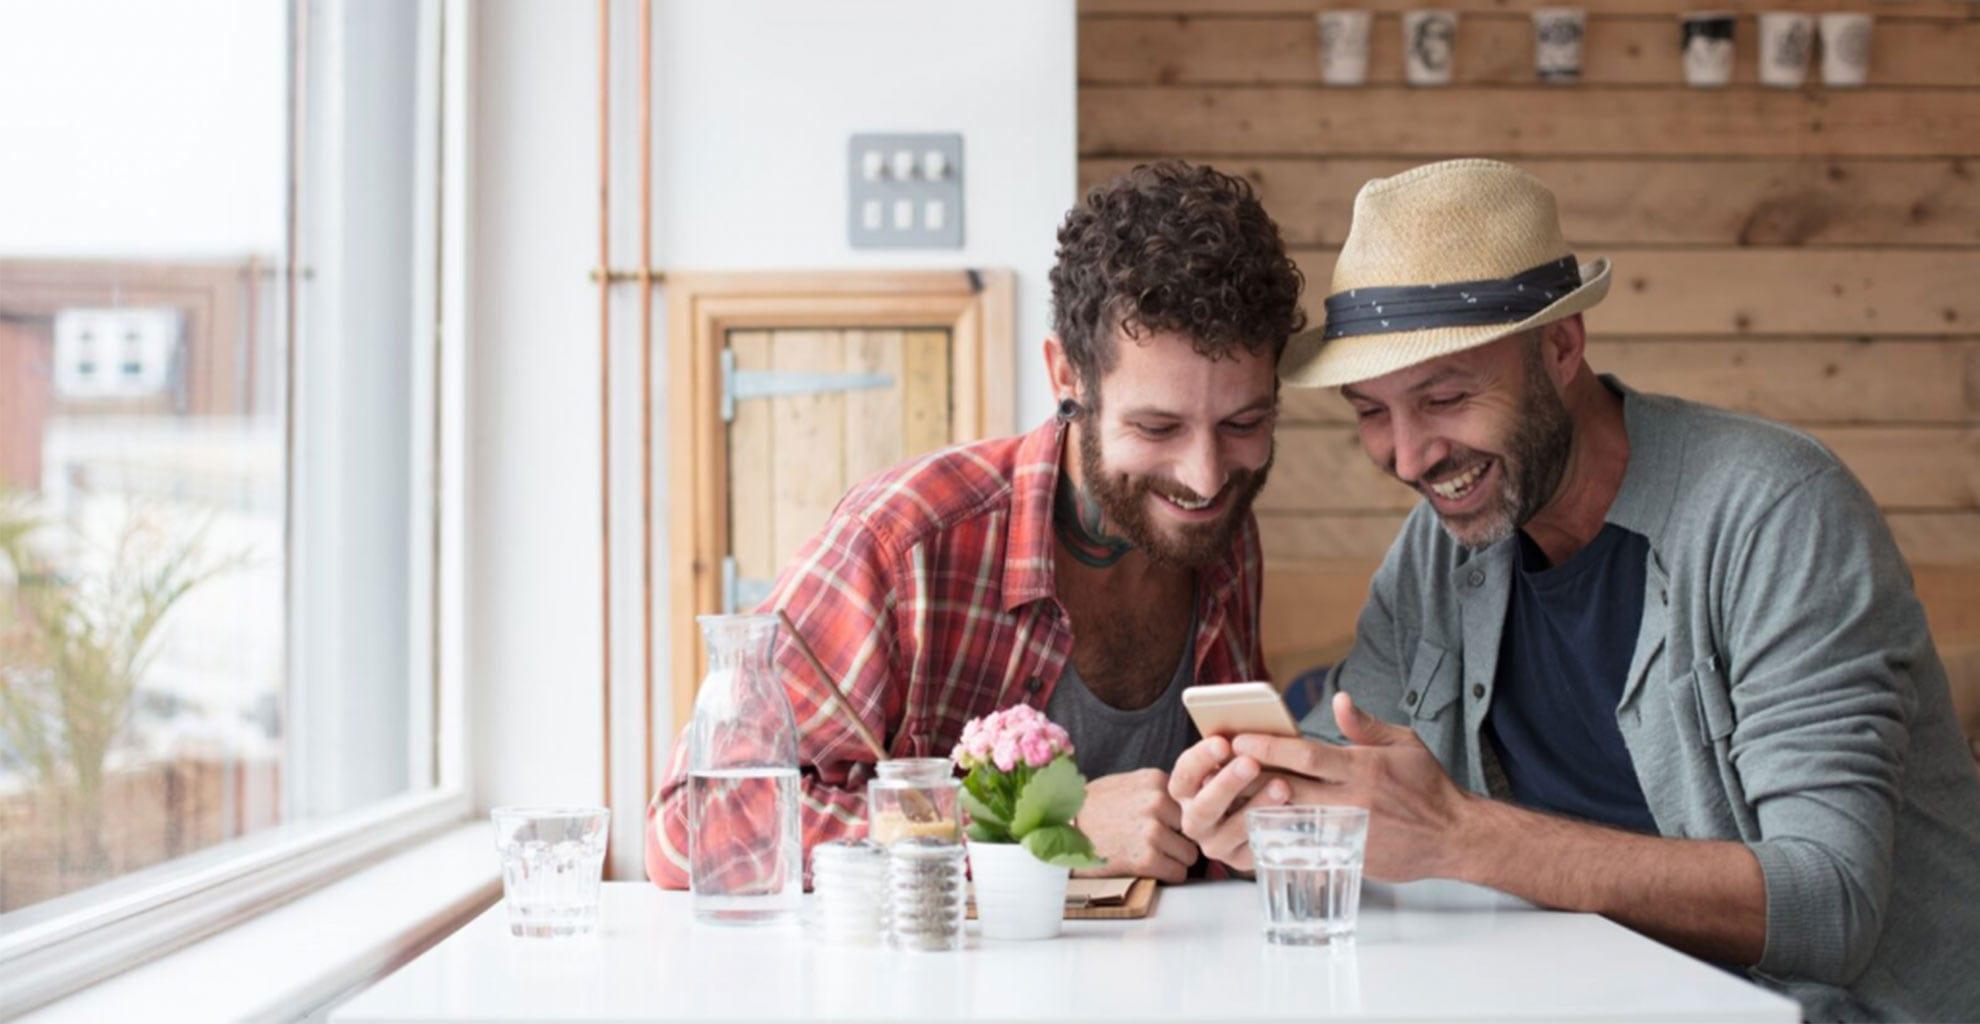 5 Common Mistakes When Deciding to Buy vs. Rent